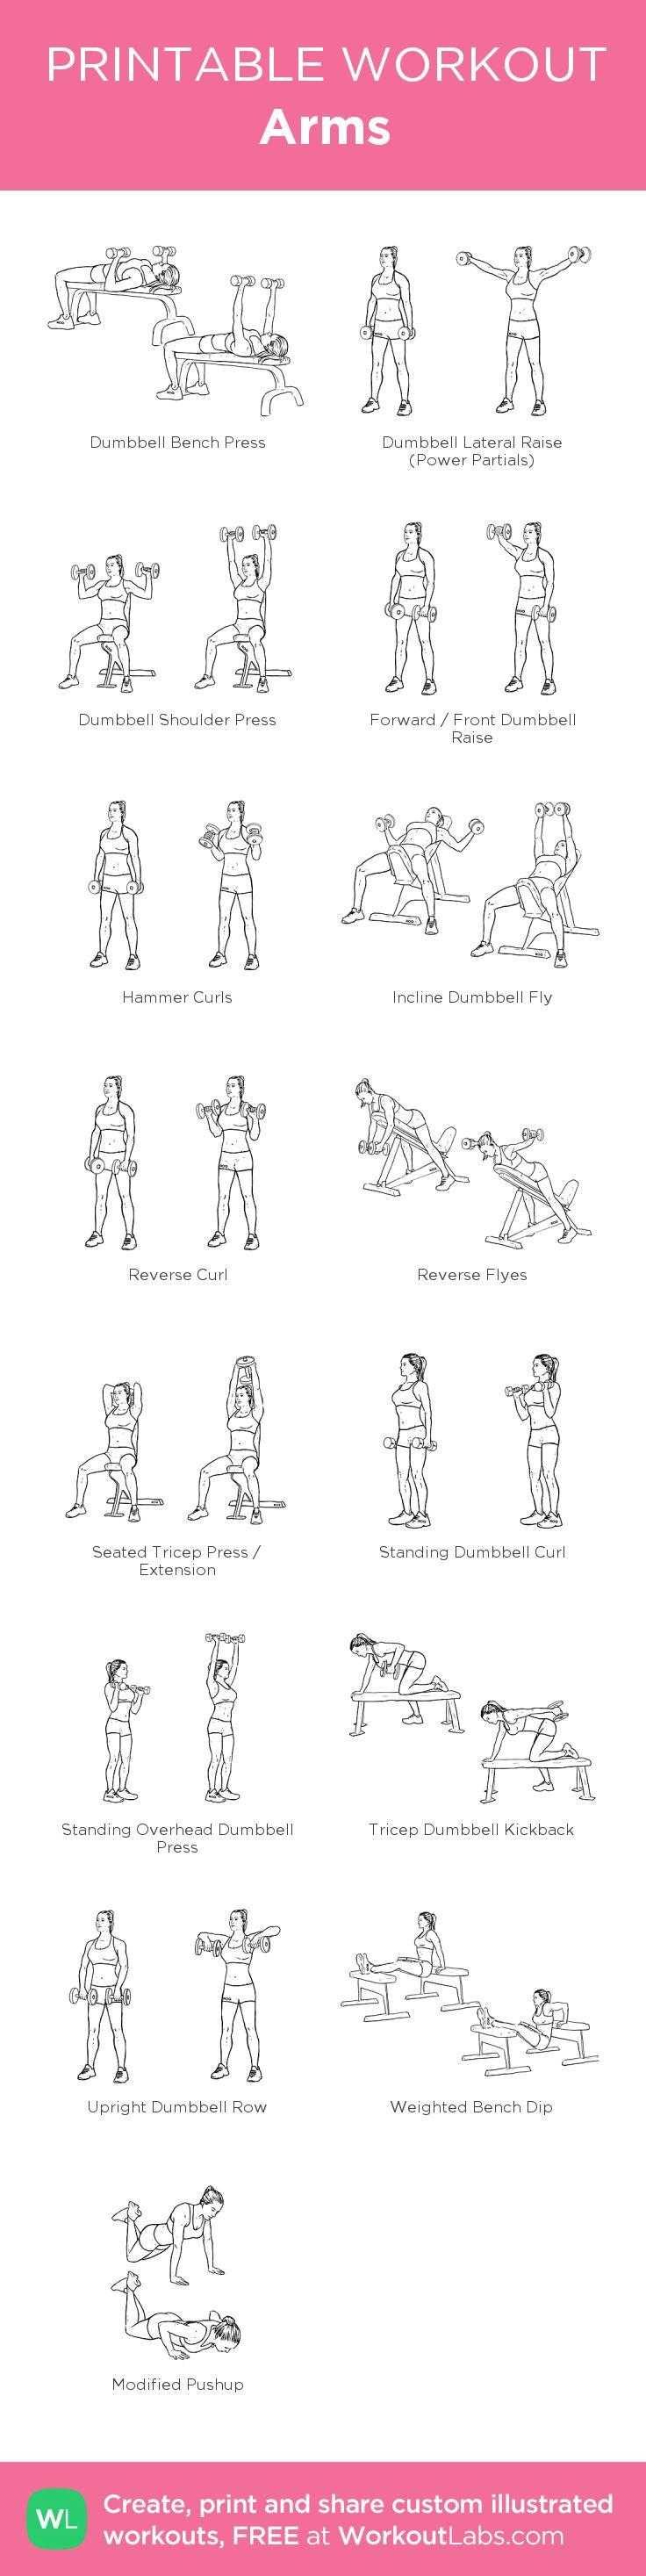 Arms:my custom printable workout by @WorkoutLabs #workoutlabs #customworkout